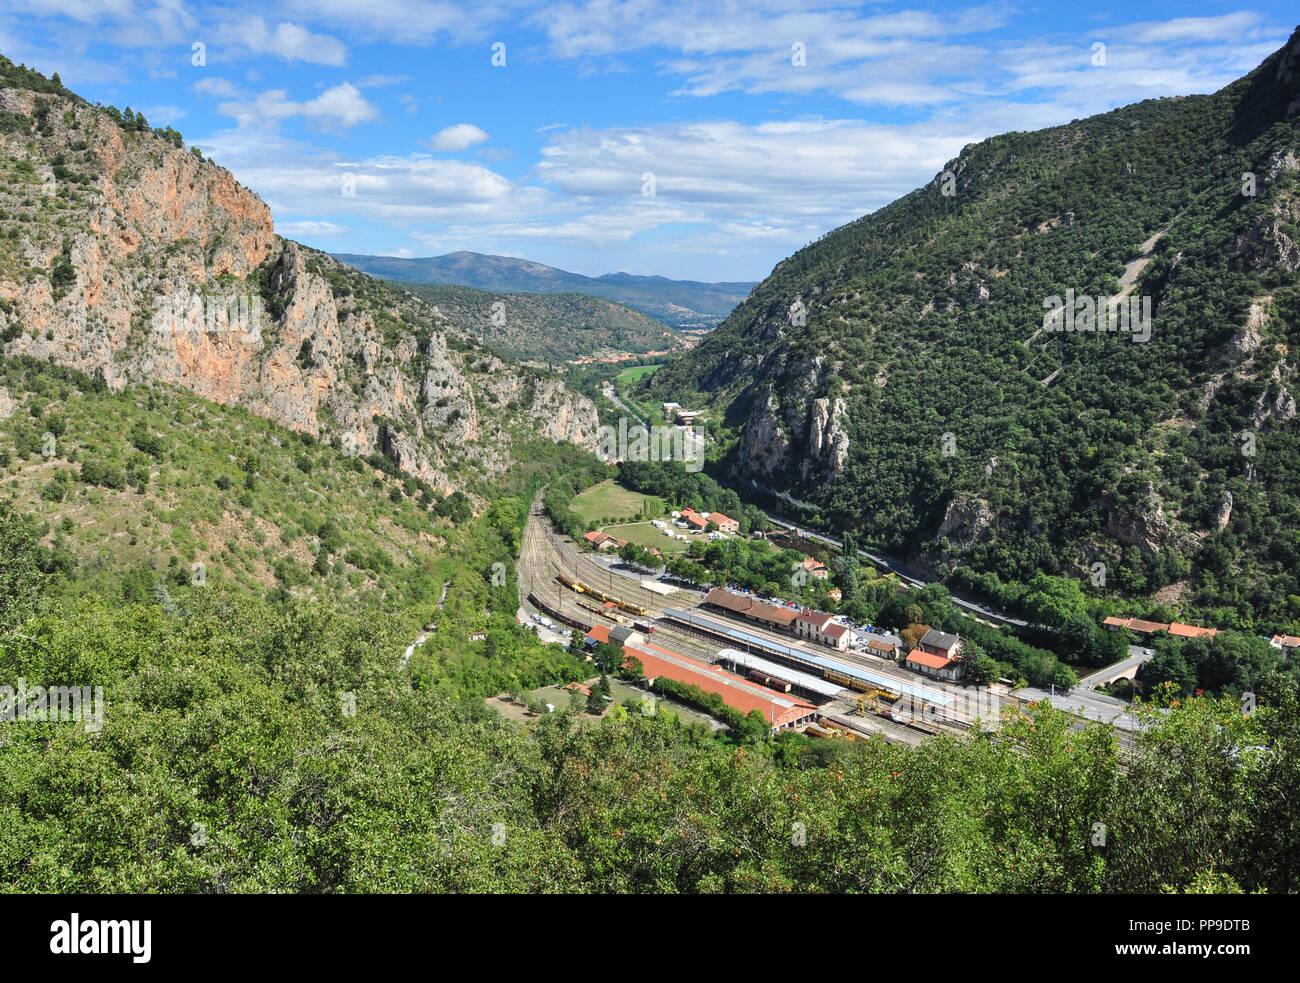 Railway station at Villefranche-de-Conflent, Pyrenees-Orientales, Occitanie, France - Stock Image